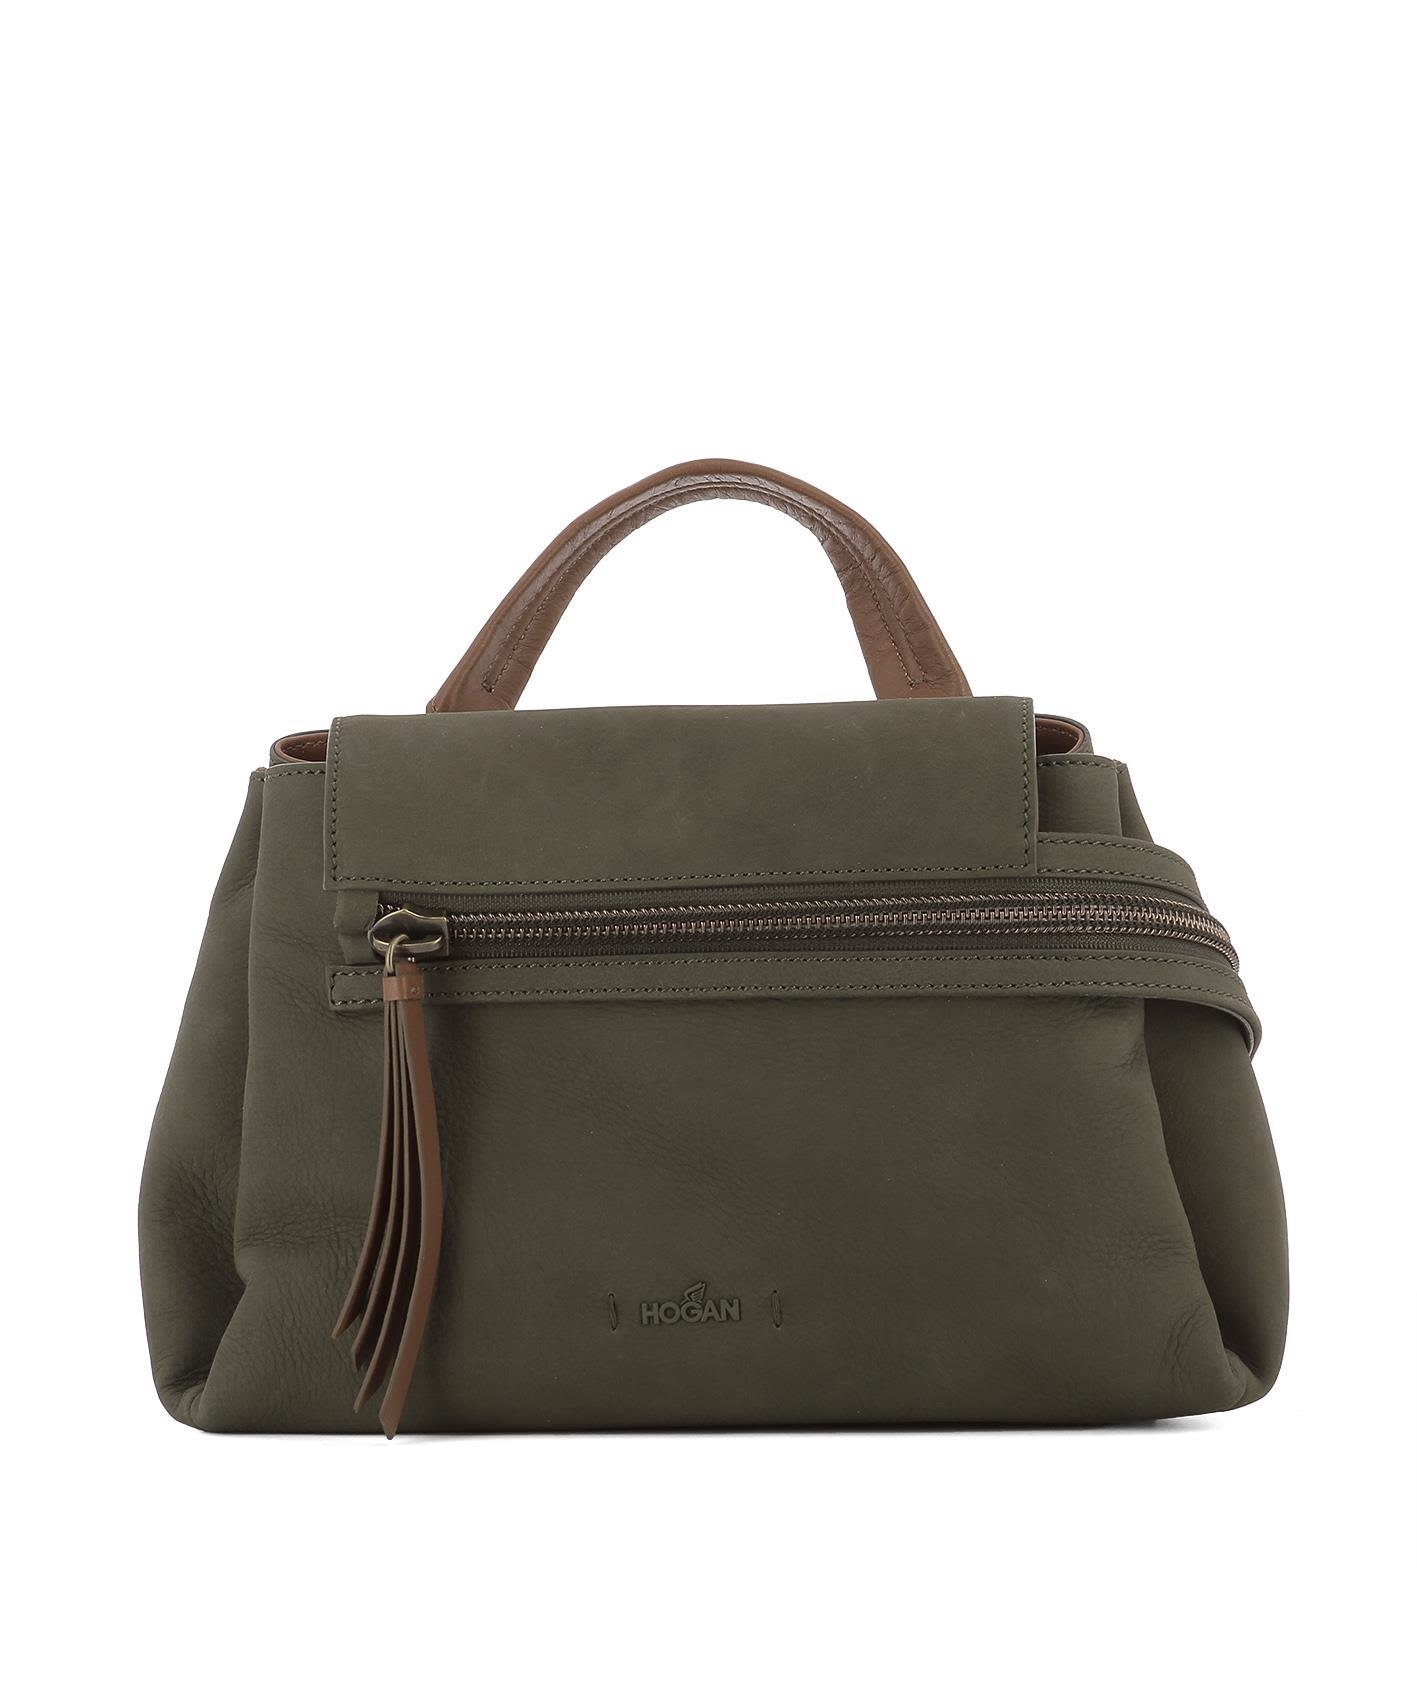 HOGAN GREEN LEATHER HANDLE BAG